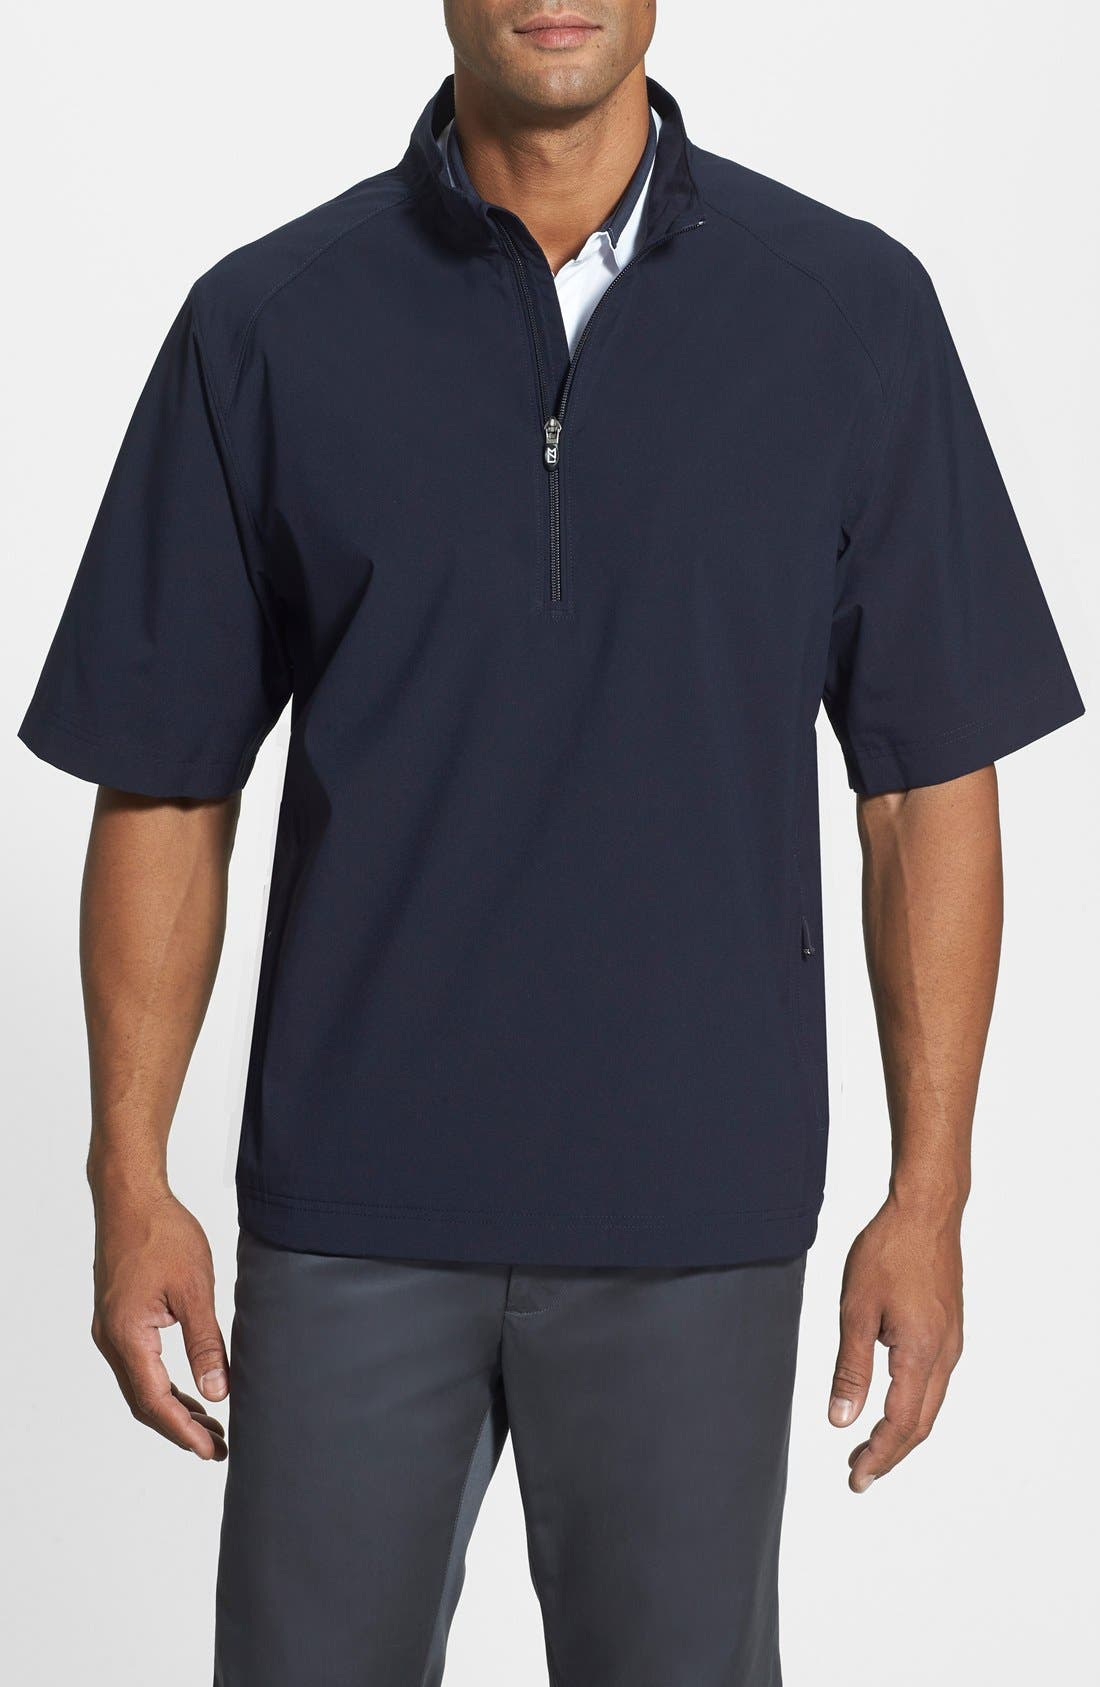 Main Image - Cutter & Buck 'WeatherTec Summit' Short Sleeve Shirt